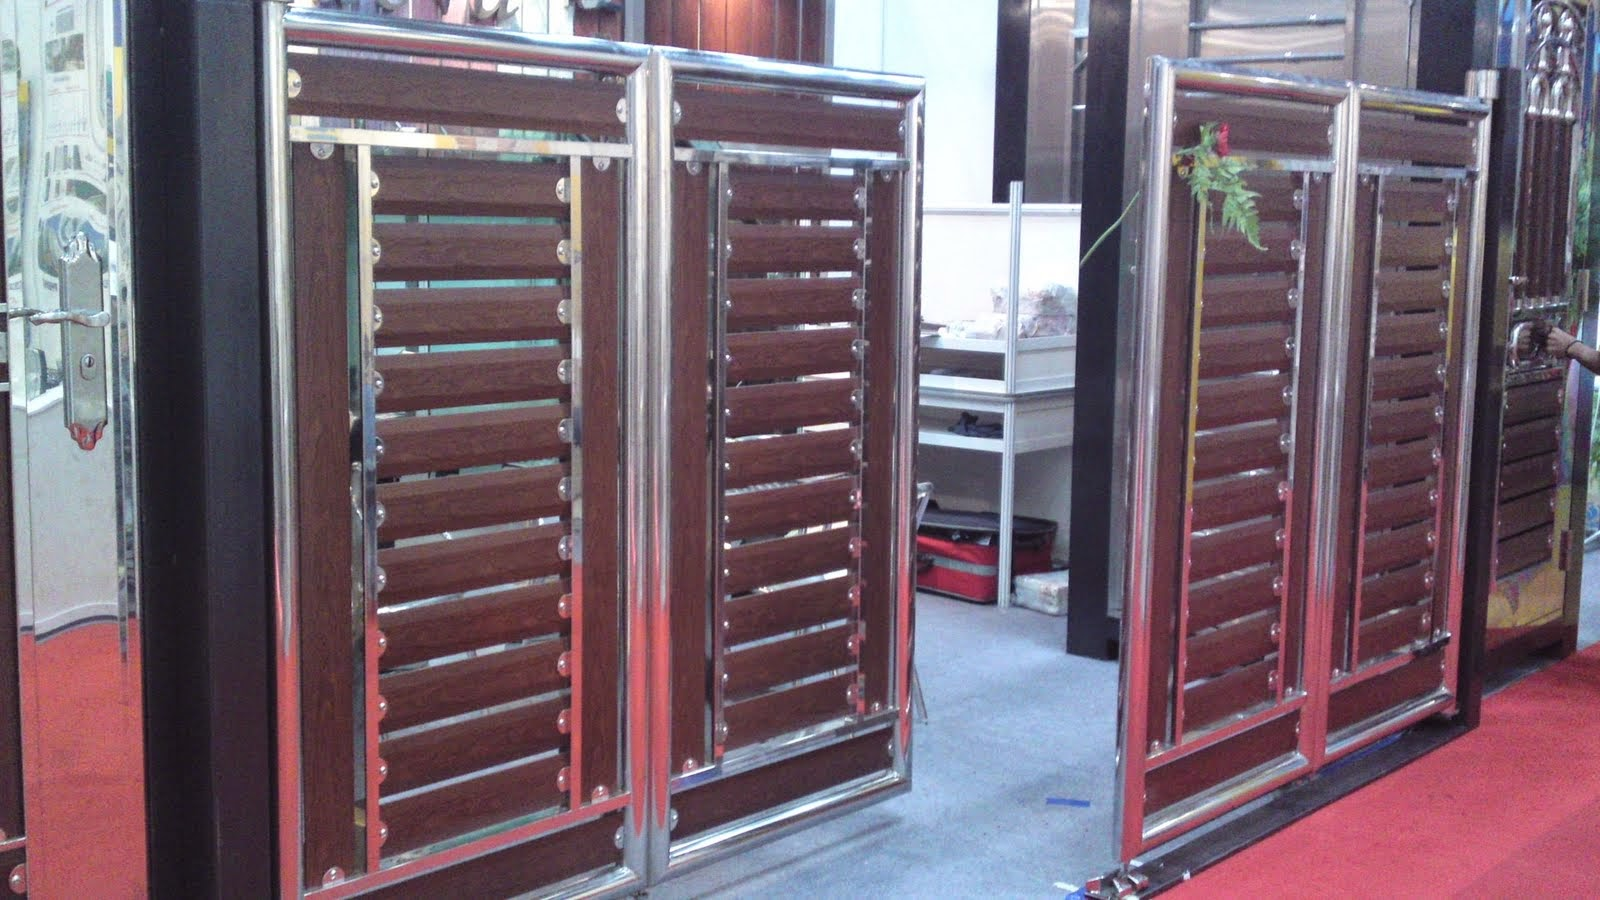 Design For Gates, Grills: Latest gates design in steel